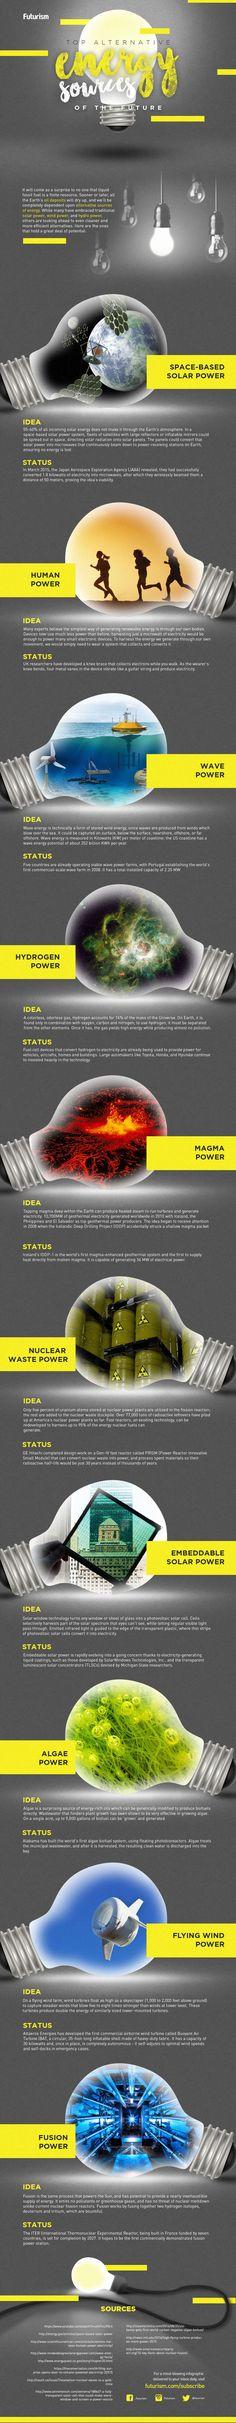 Renewable Energy Sources Of Tomorrow